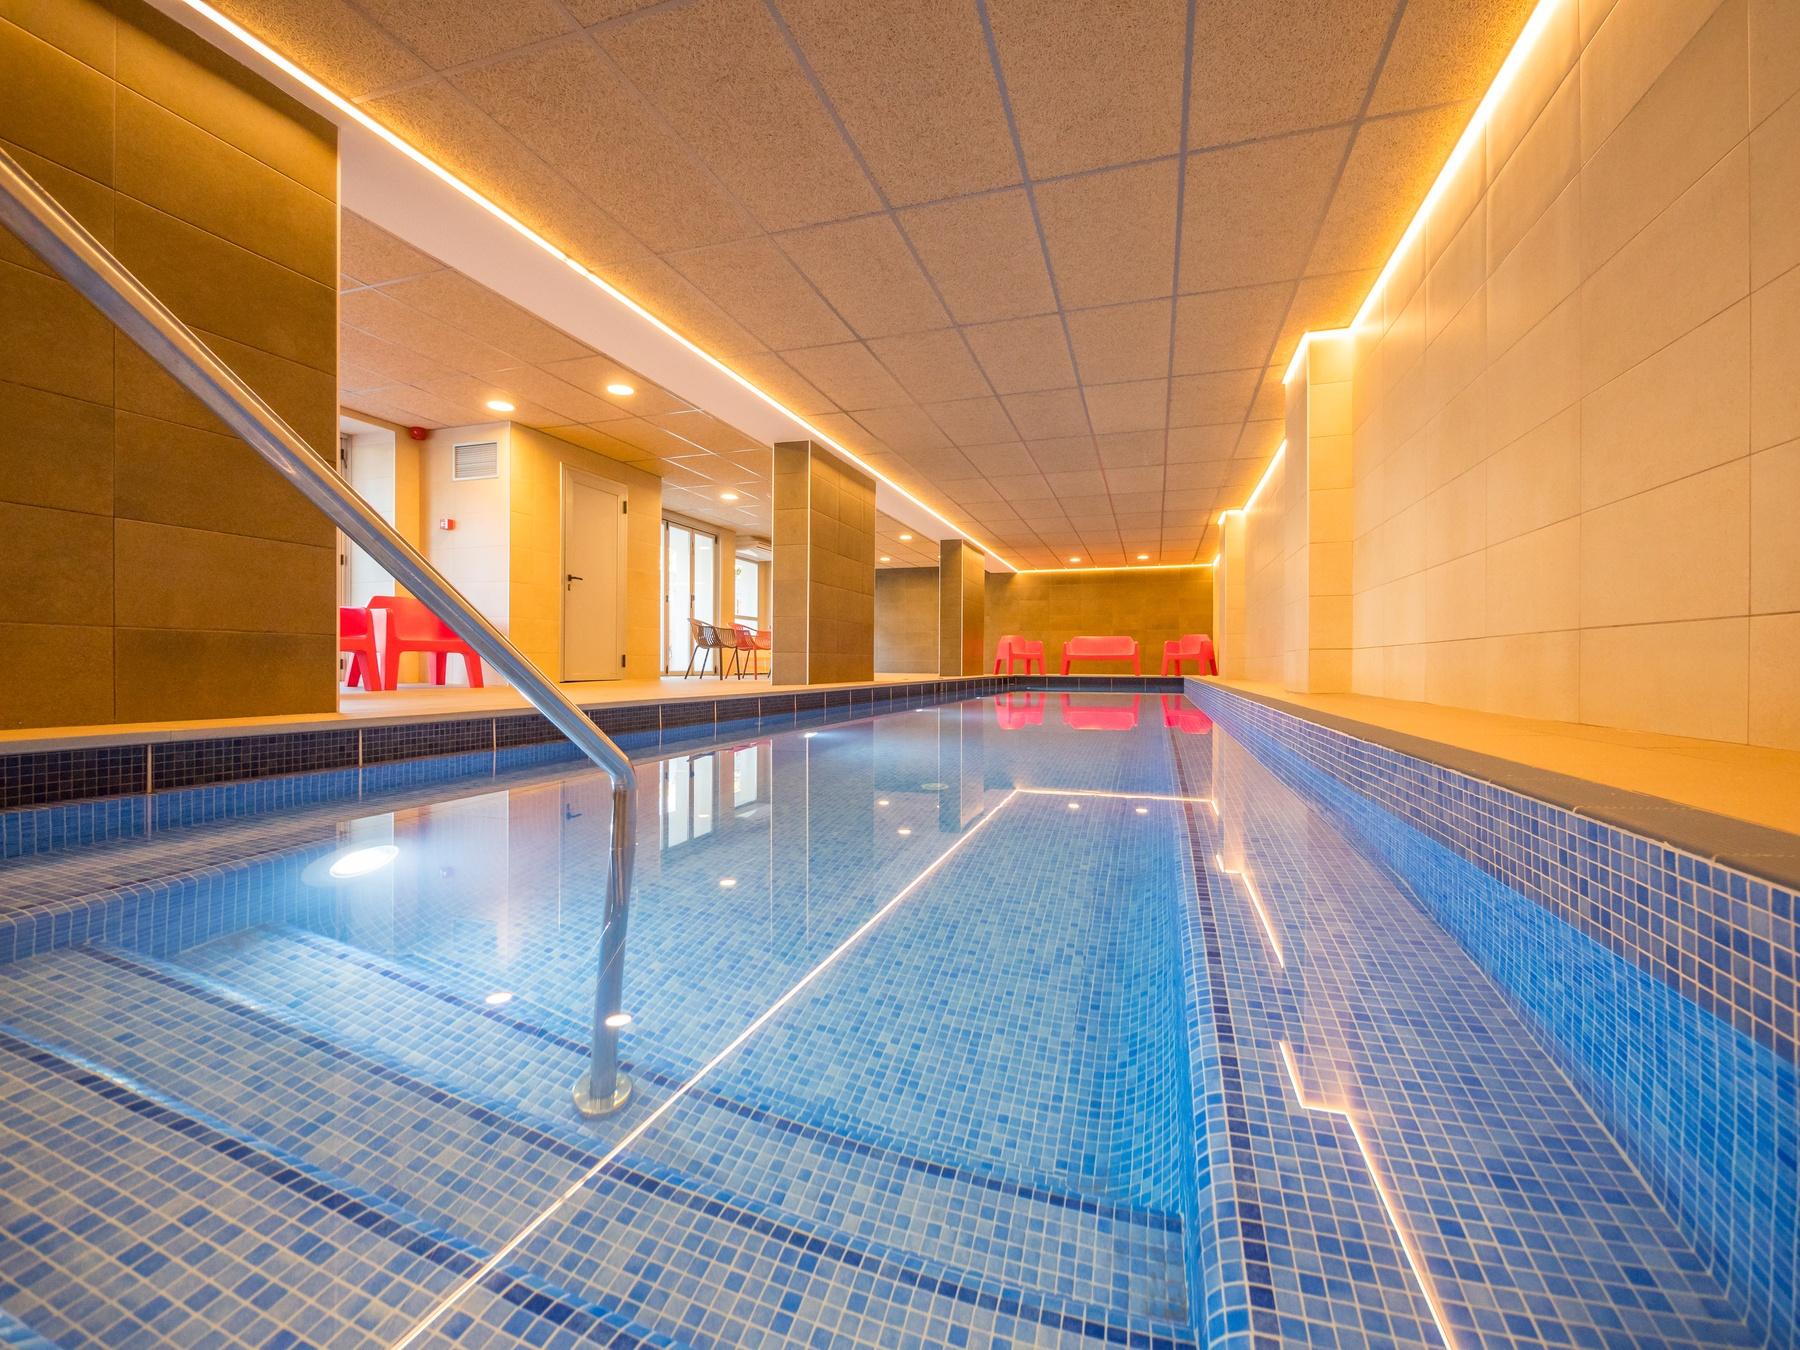 hotel habitaciones familiares playa Salou Costa Dorada piscina climatizada